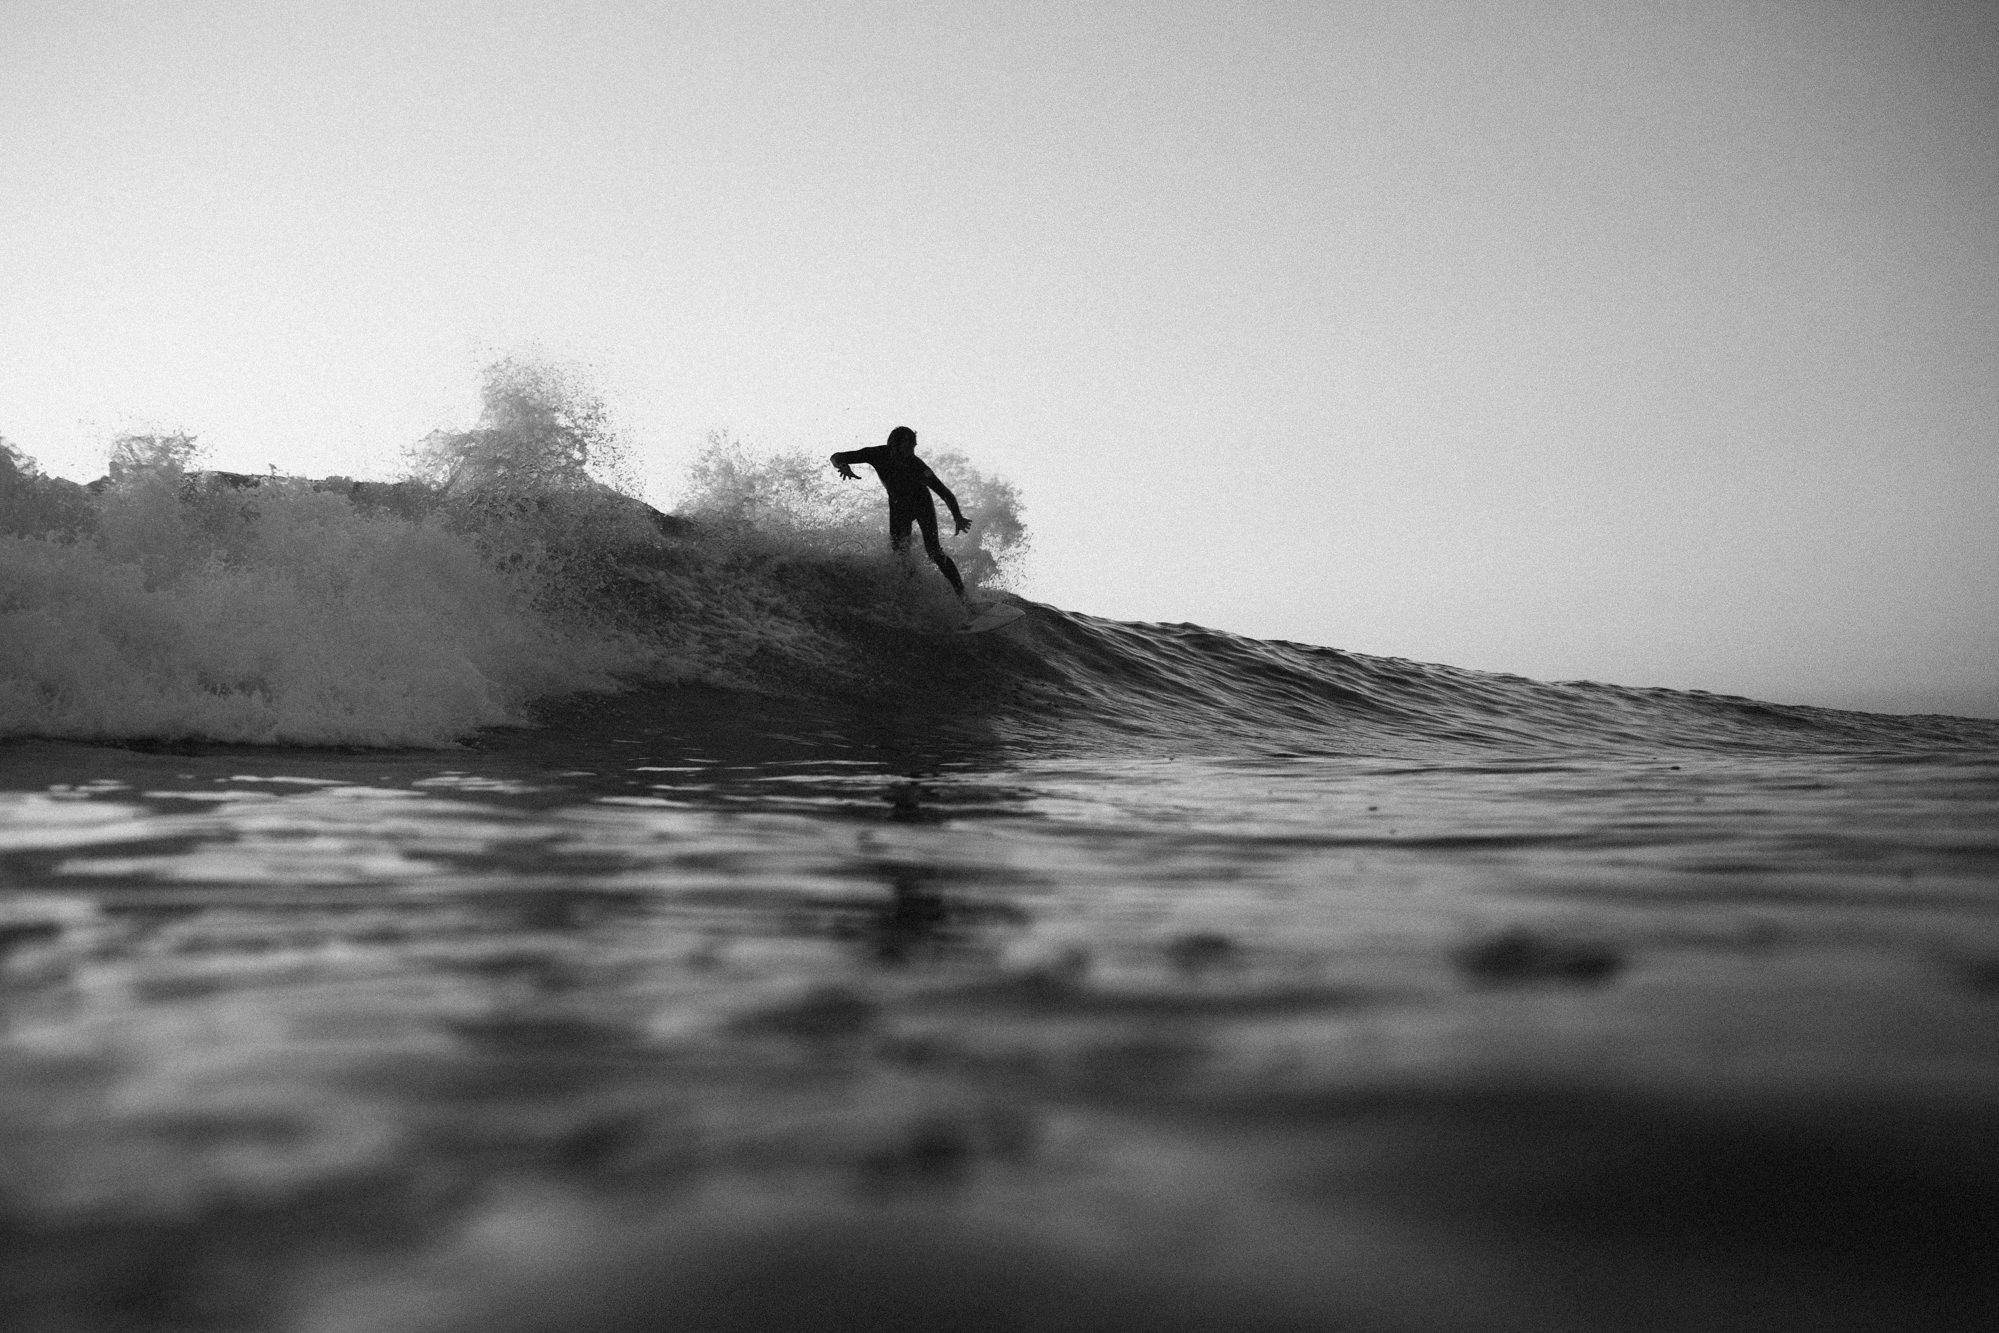 celinehamelin-photographe-aquatique-underwater-session-social-coupledansleau-ocean6.jpg